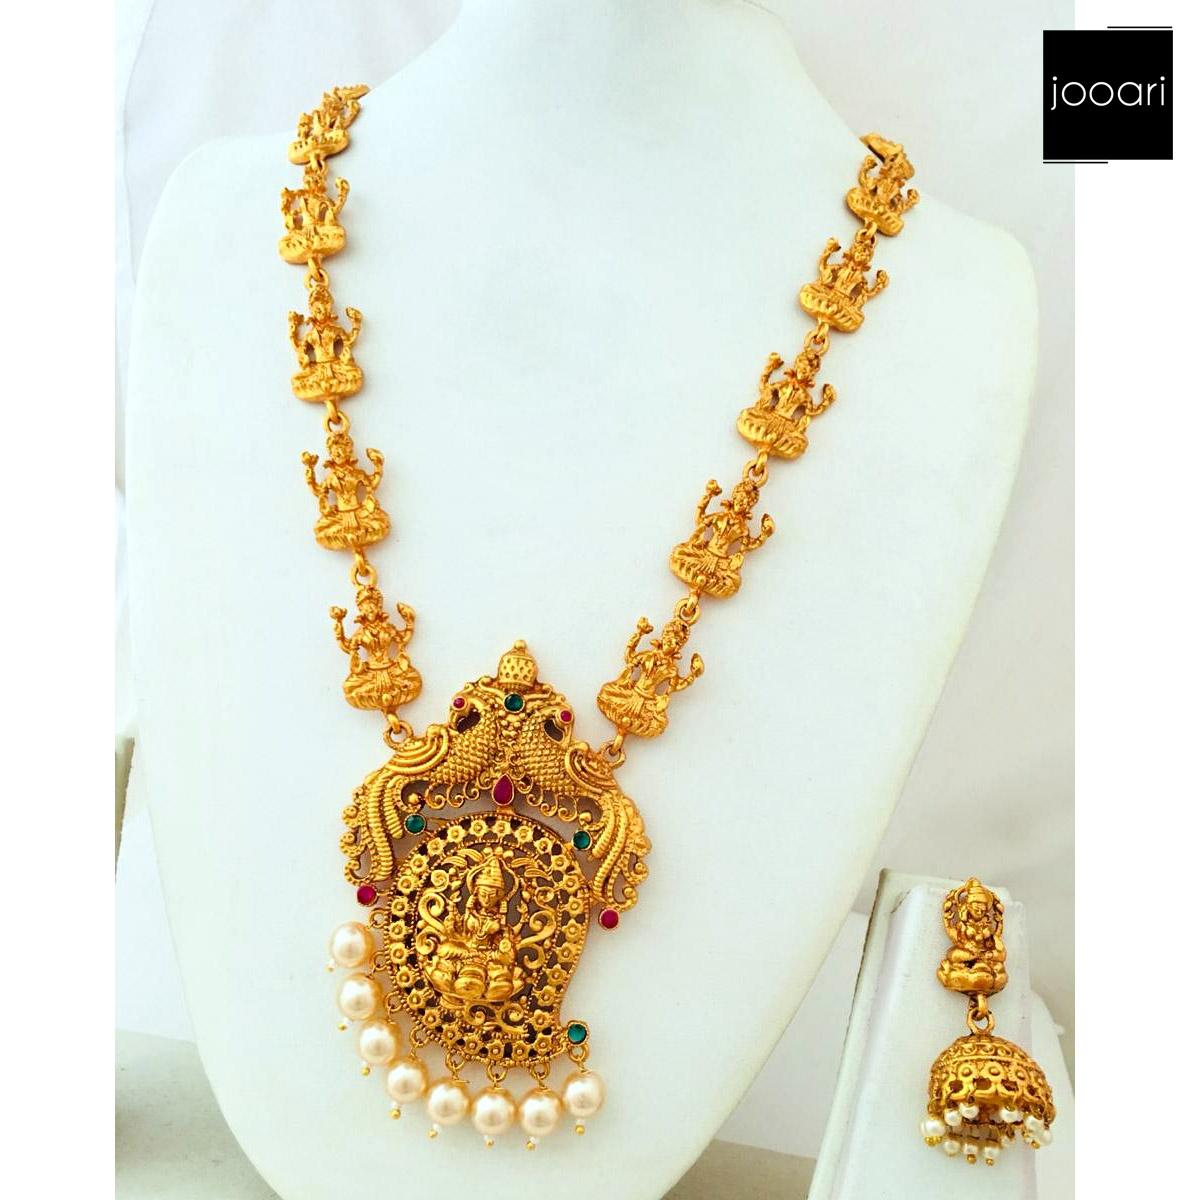 Pure Copper Matt Finish Premium Quality Long Temple Necklace for Women